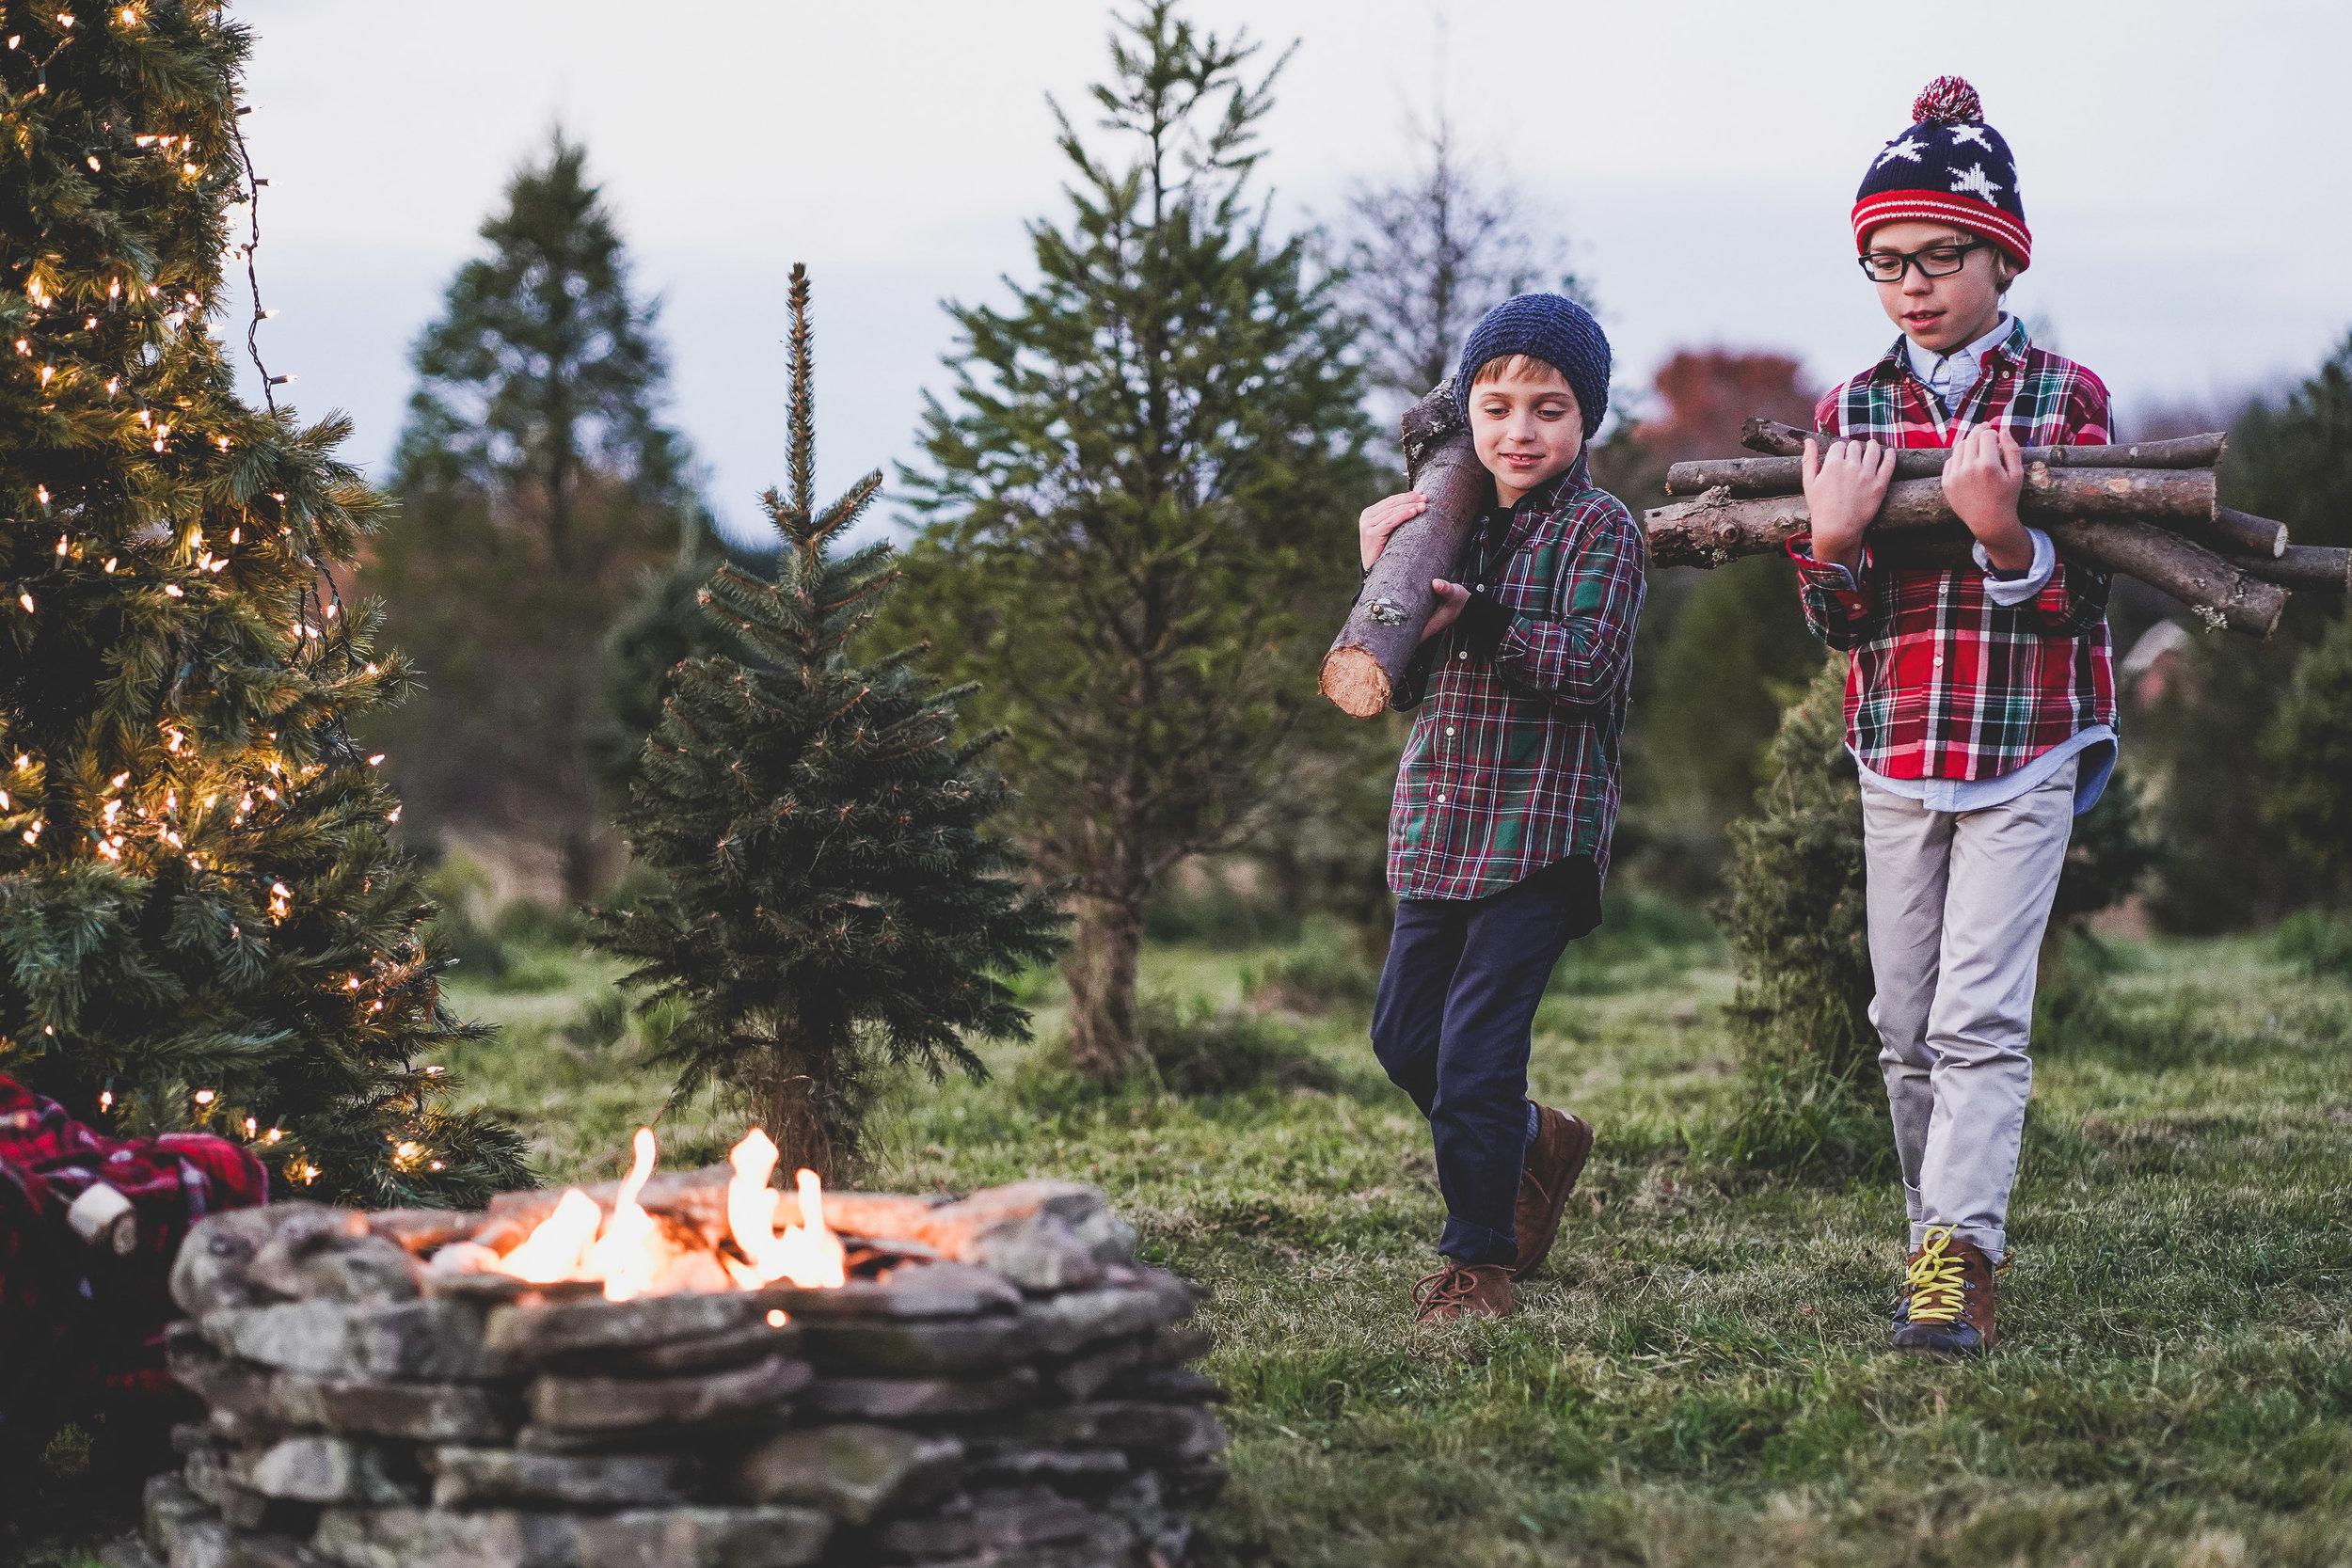 Clarks-Summit-Scranton-Photographers-christmas-holidays-card-5.jpg